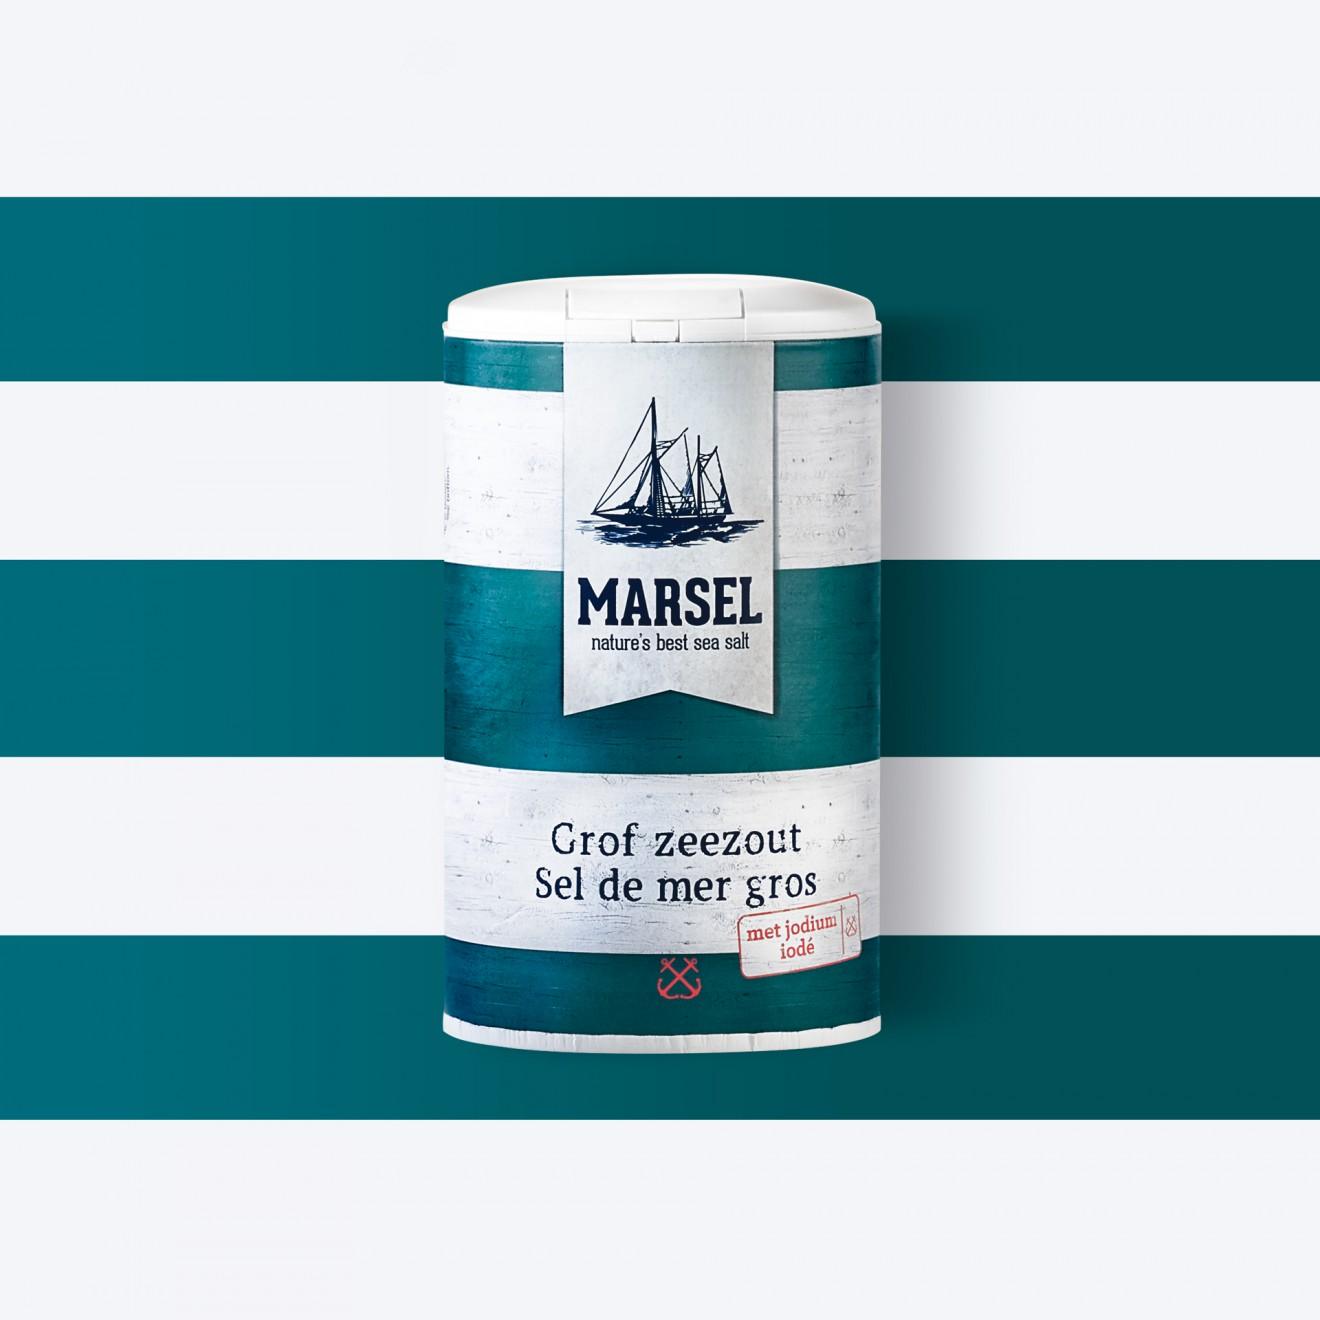 Quatre Mains package design - sea salt, fisher boat, sailor